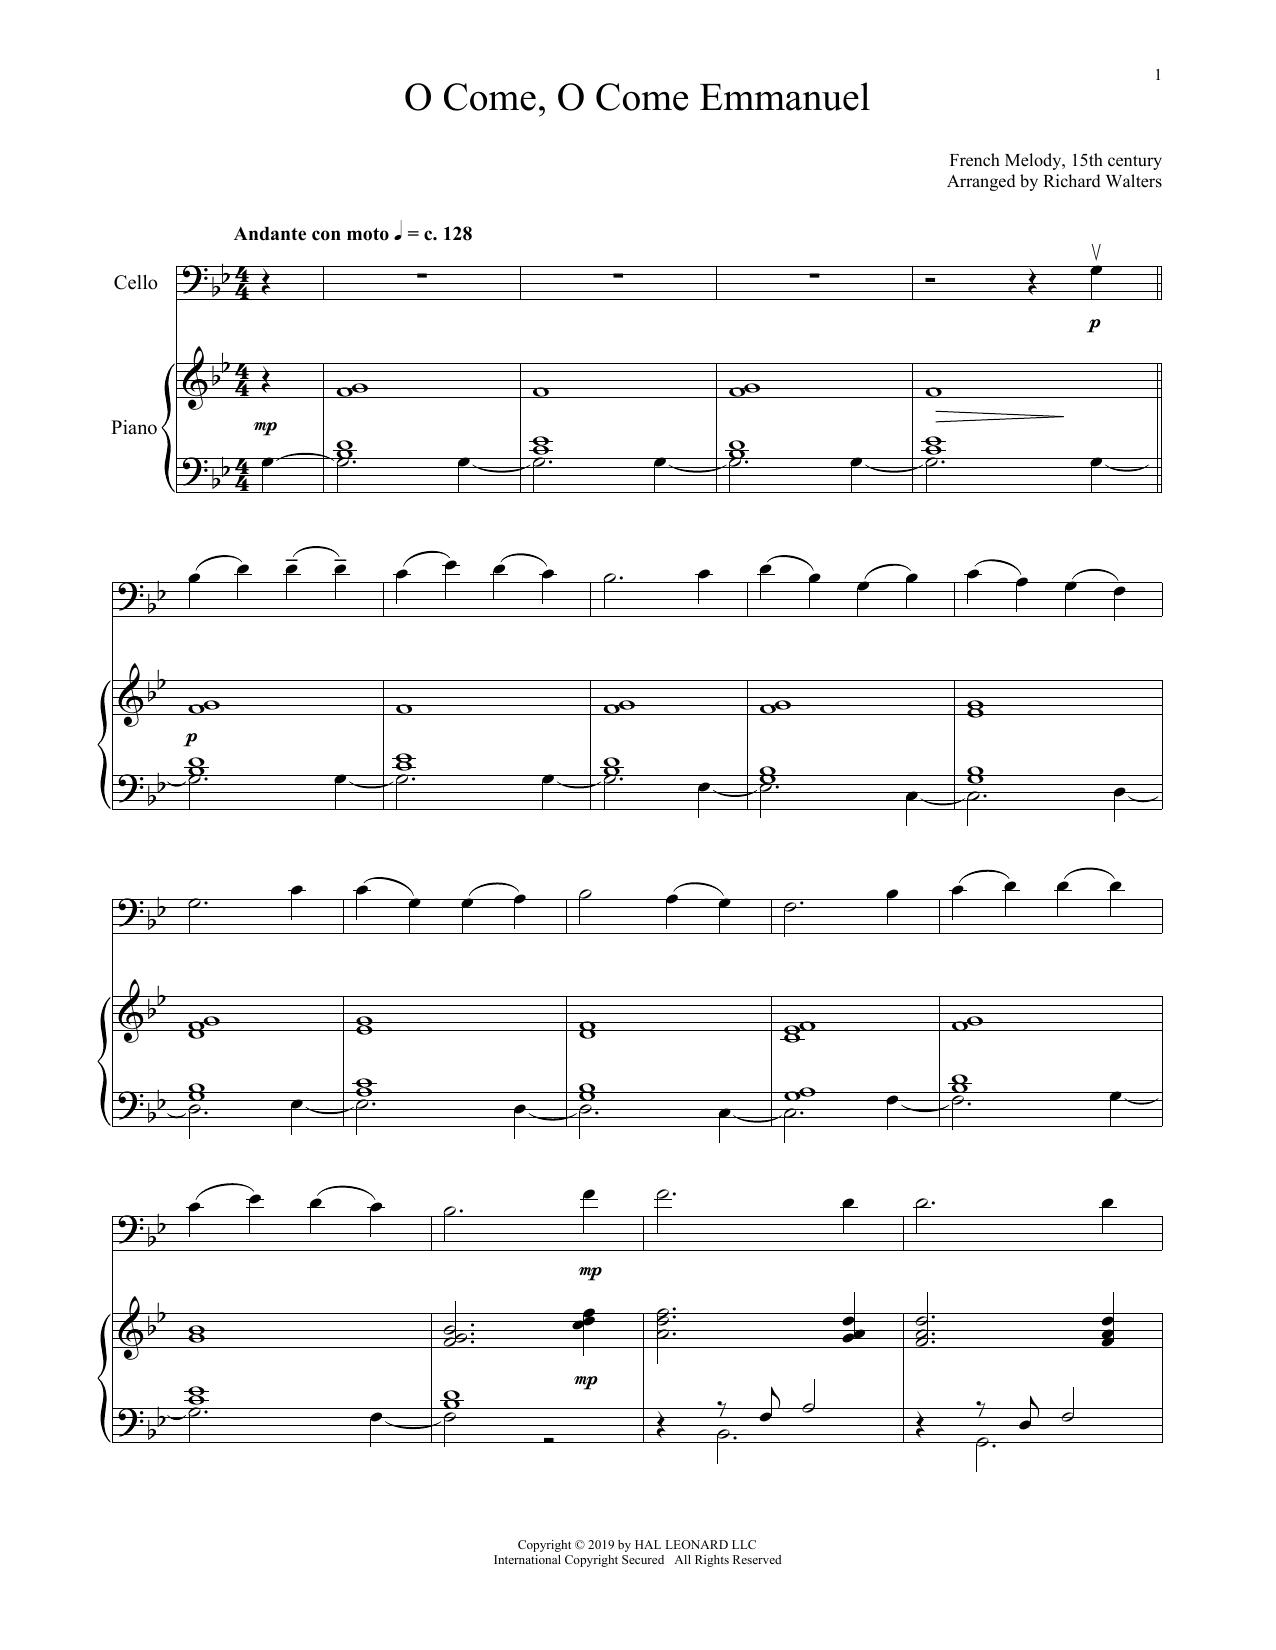 O Come, O Come, Emmanuel (Cello and Piano)